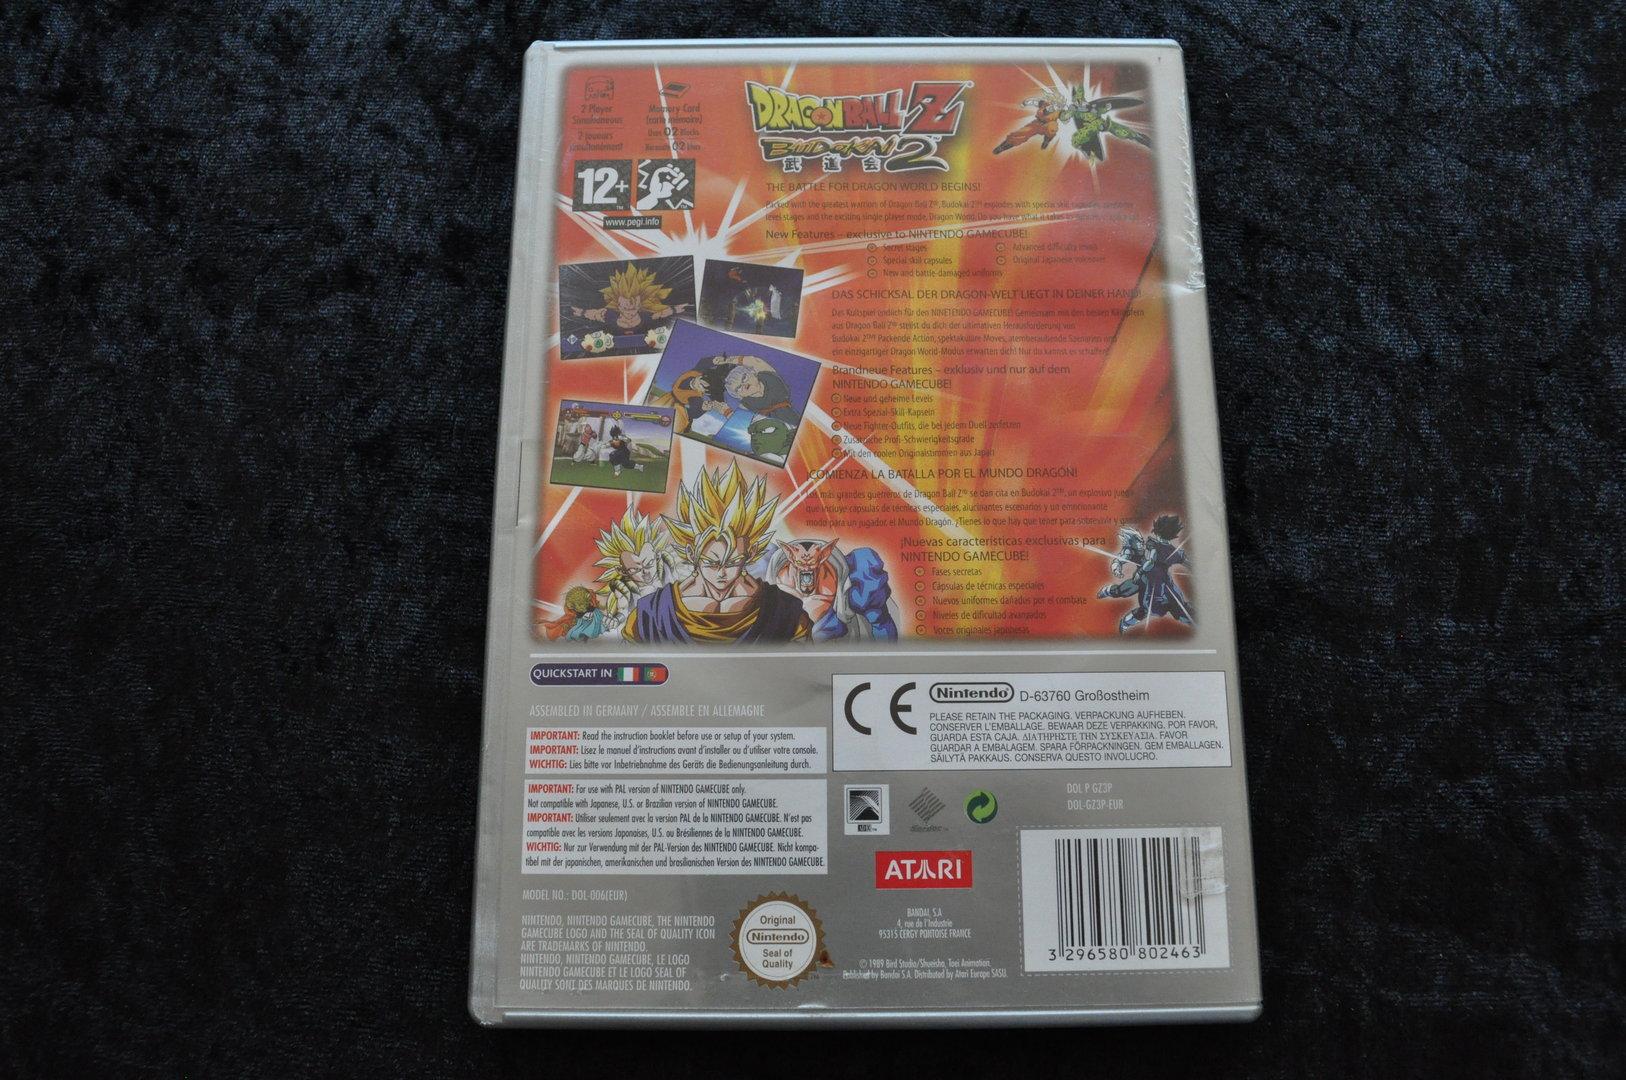 Dragon Ball Z Budokai 2 GameCube Players Choice